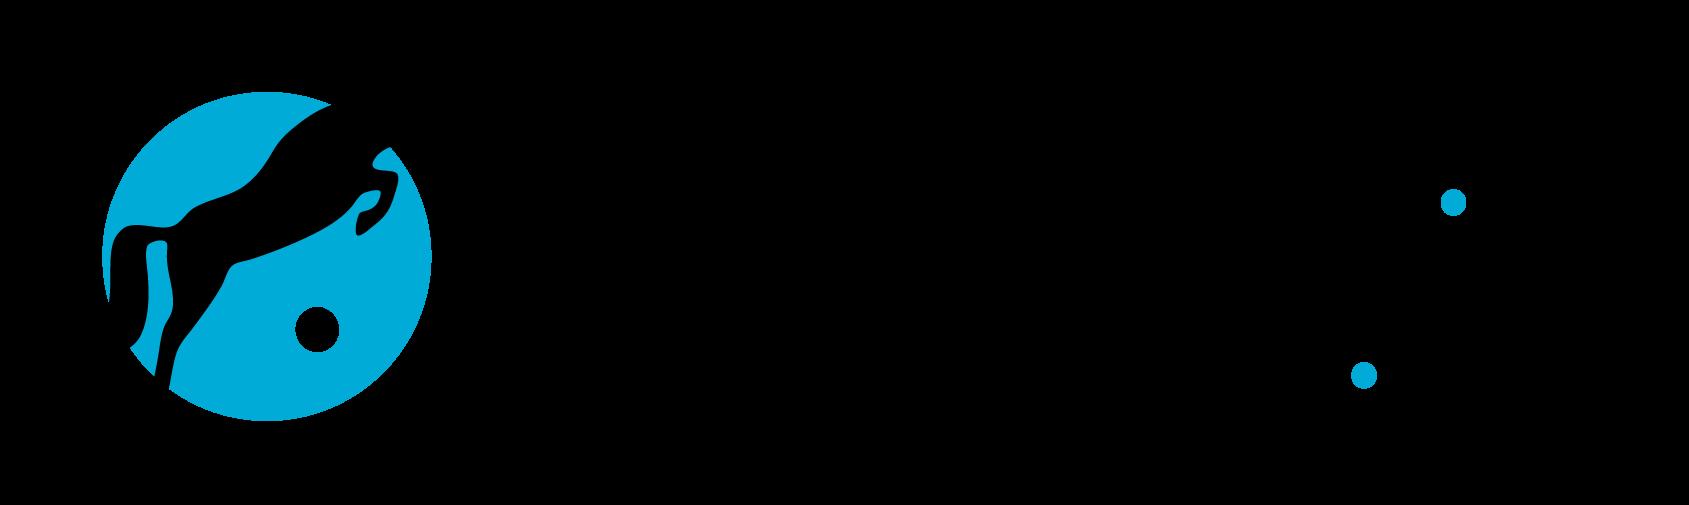 Verkaufspferde.cz/horsesforsale.cz logo